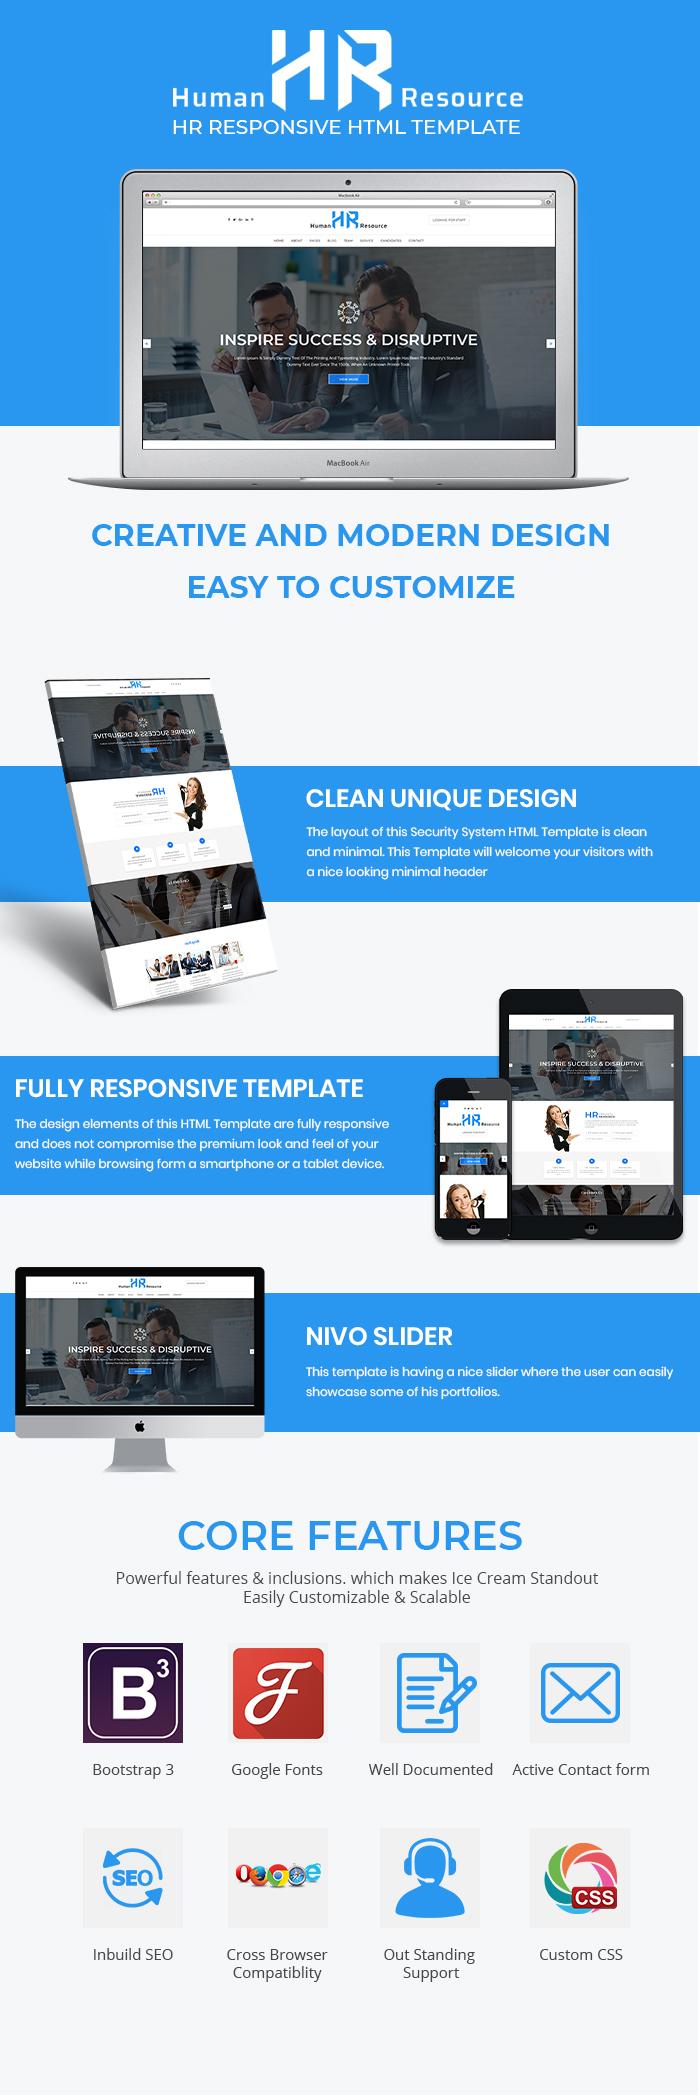 Human Resource HTML Website Templates